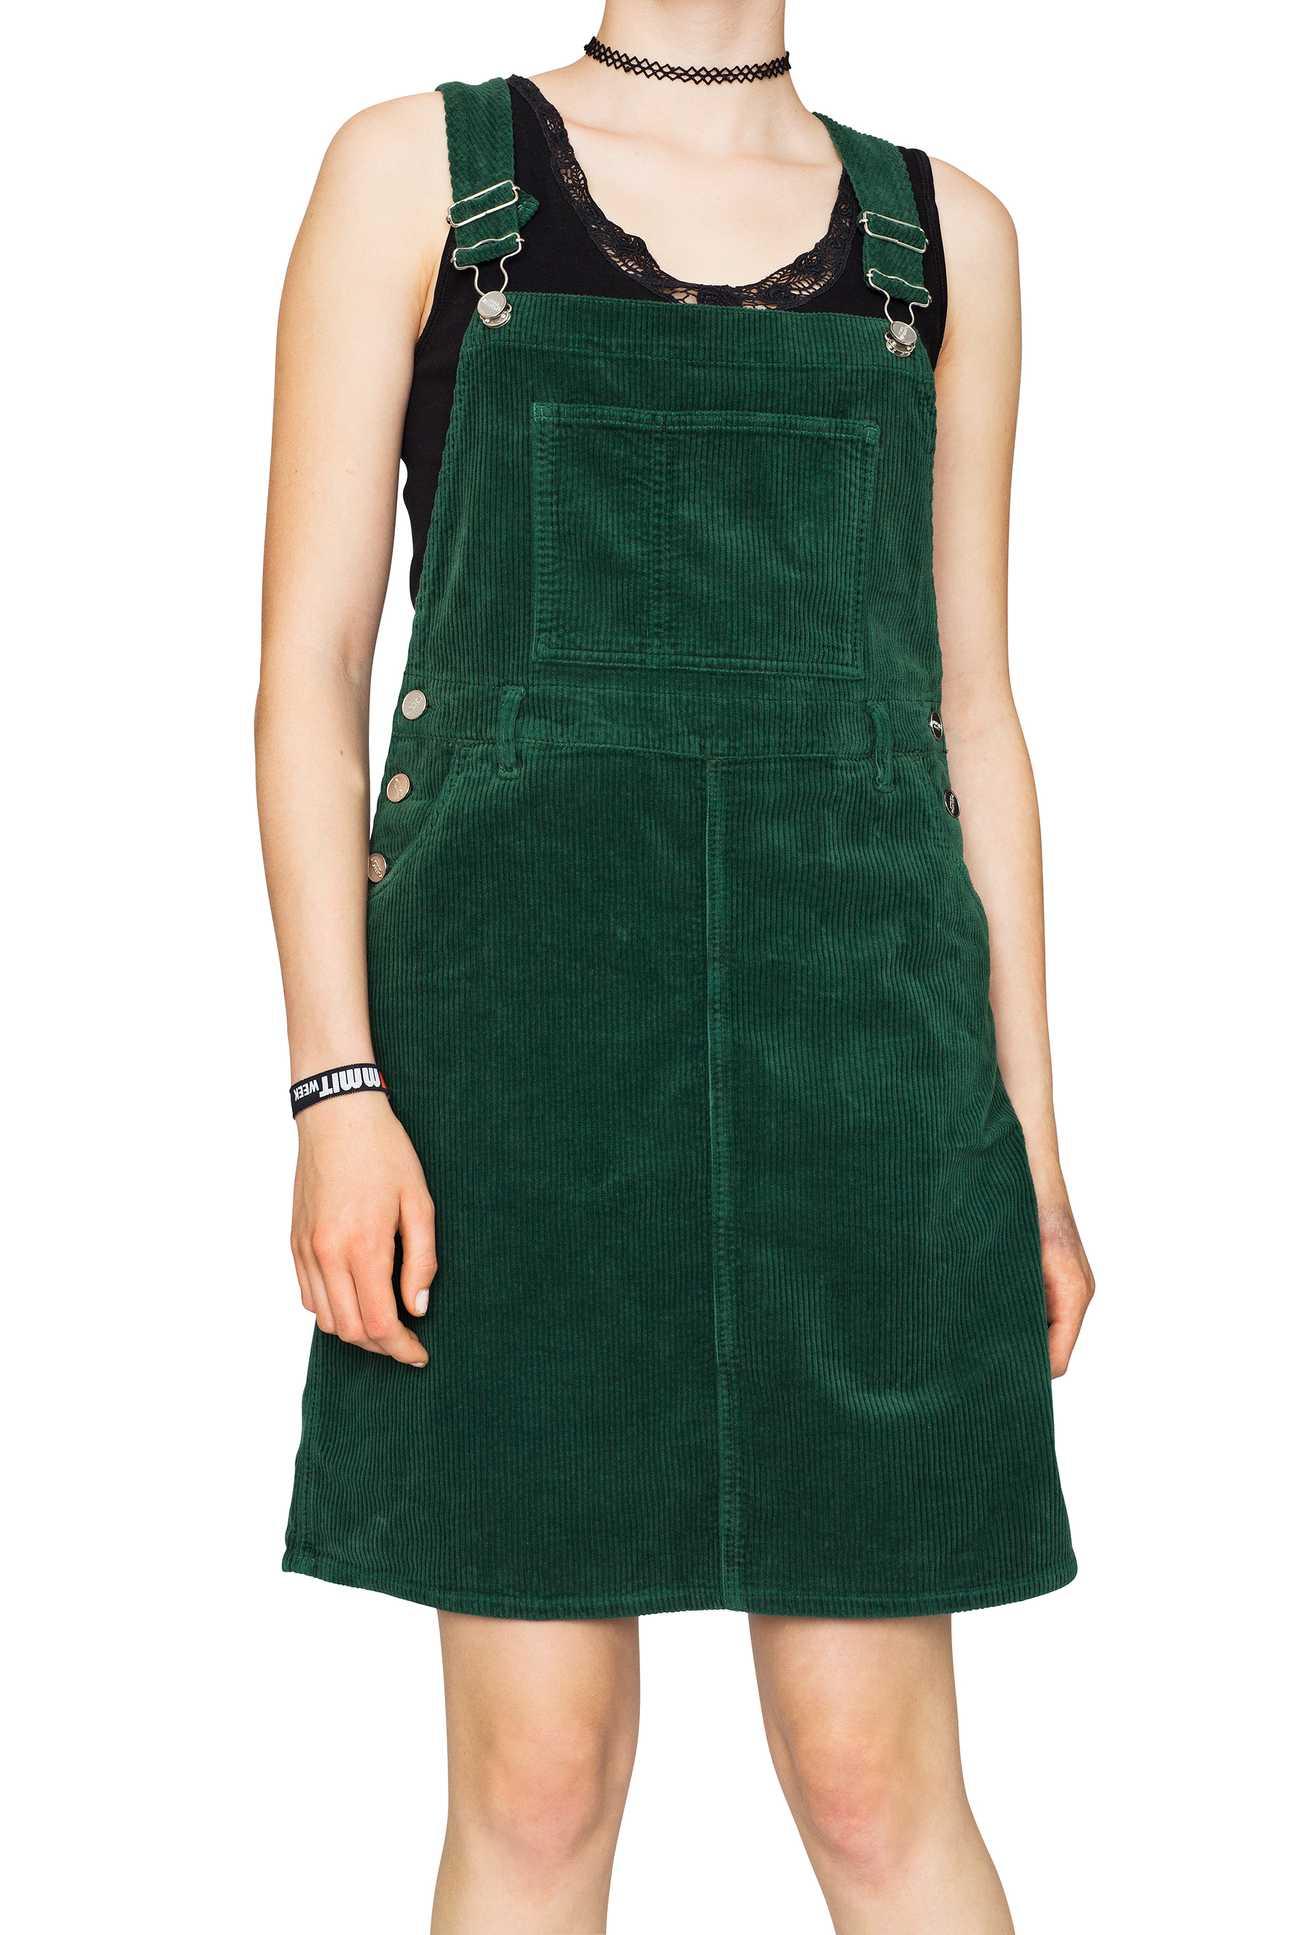 Product image Carpenter Dress